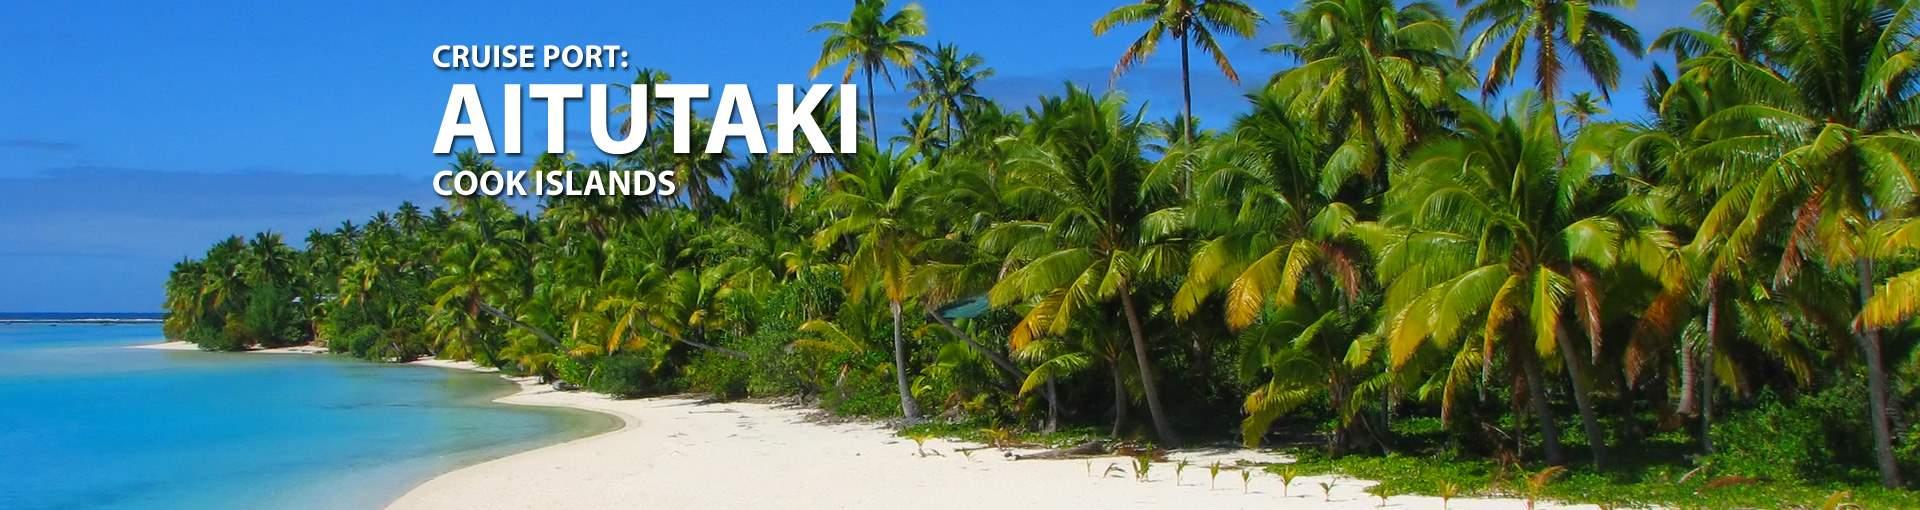 Cruises to Aitutaki, Cook Islands